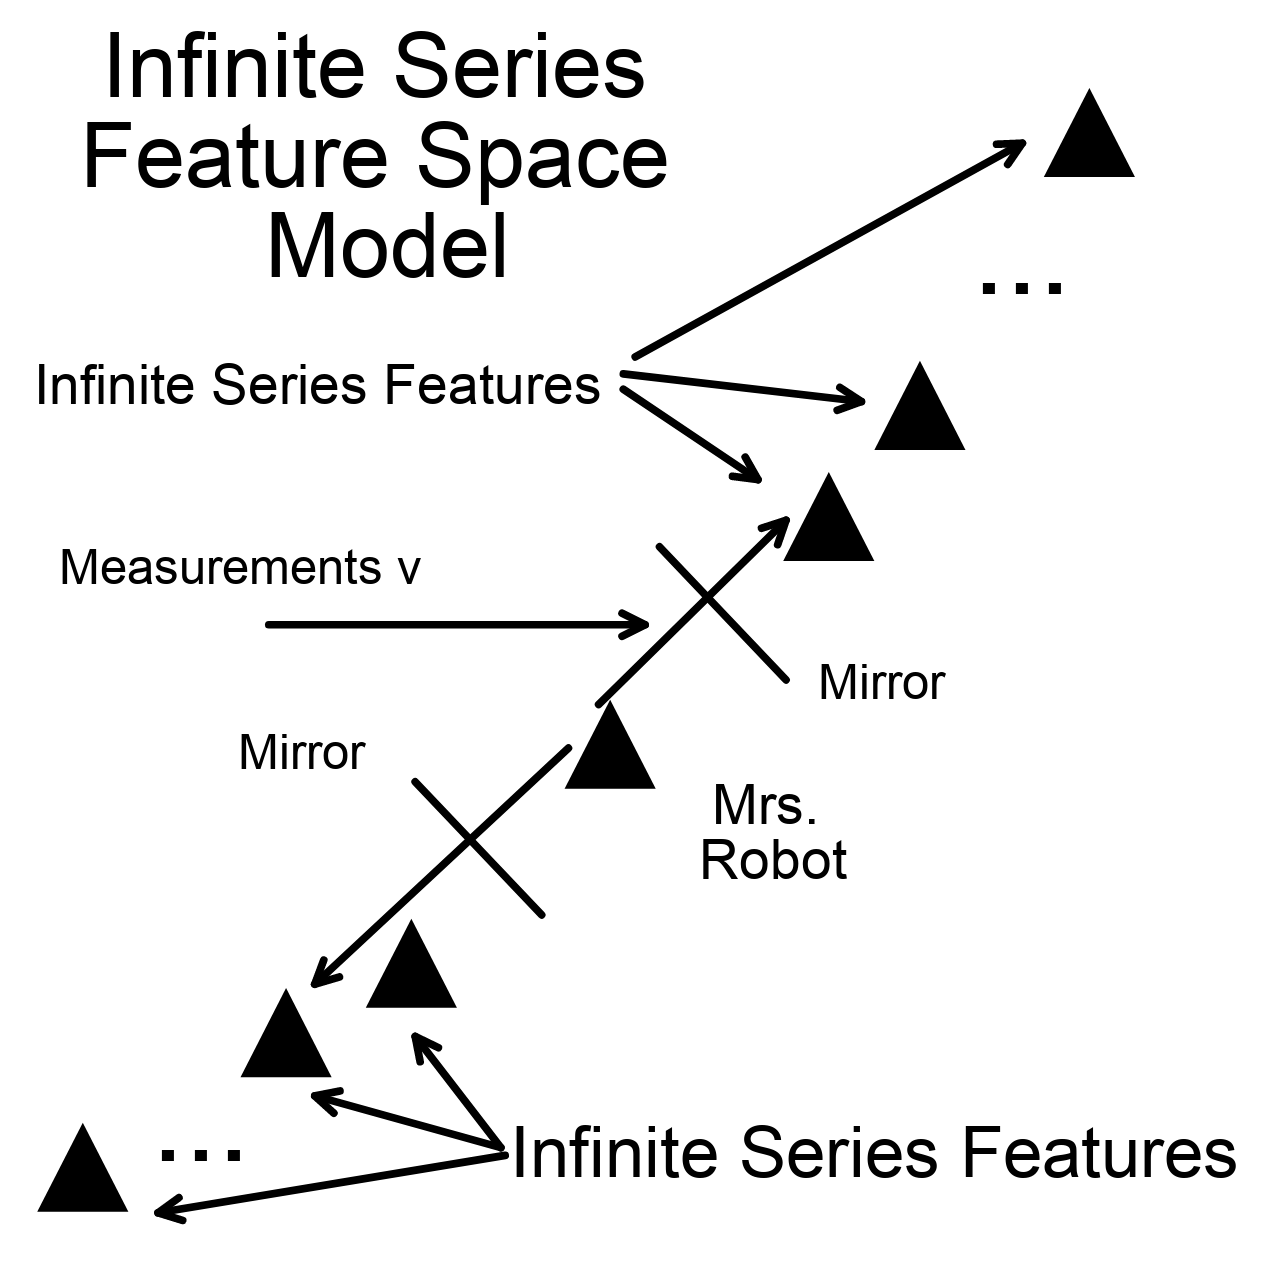 Infinite Series Feature Space SLAM Model Diagram